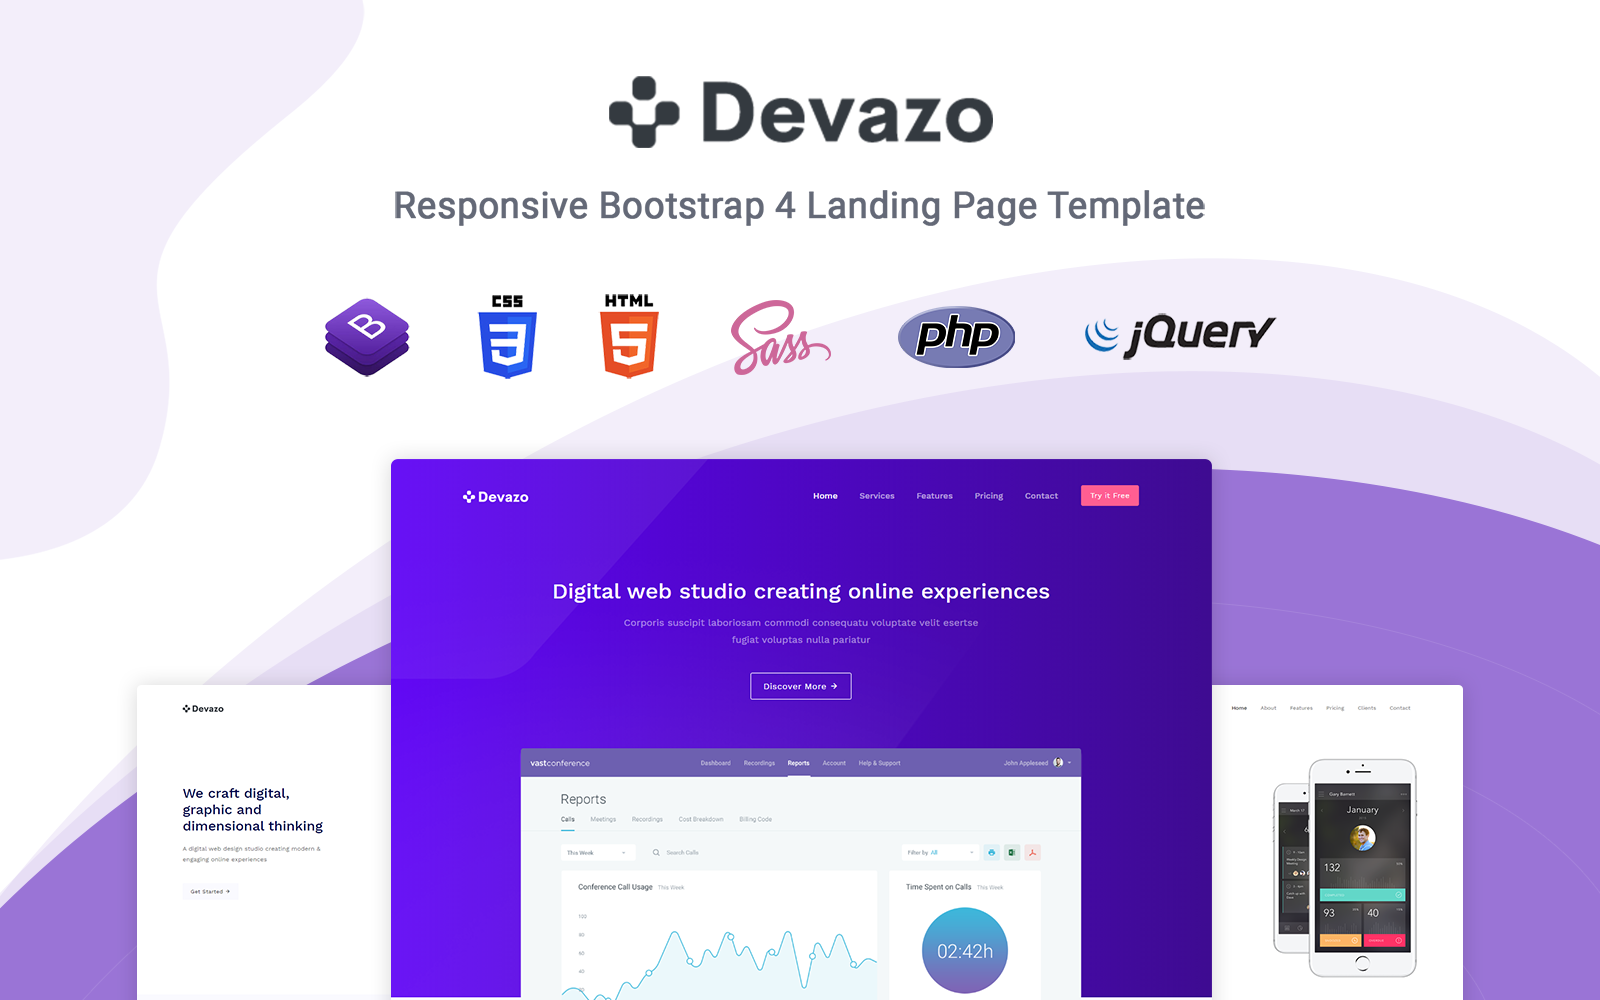 Devazo - Responsive Landing Page Template